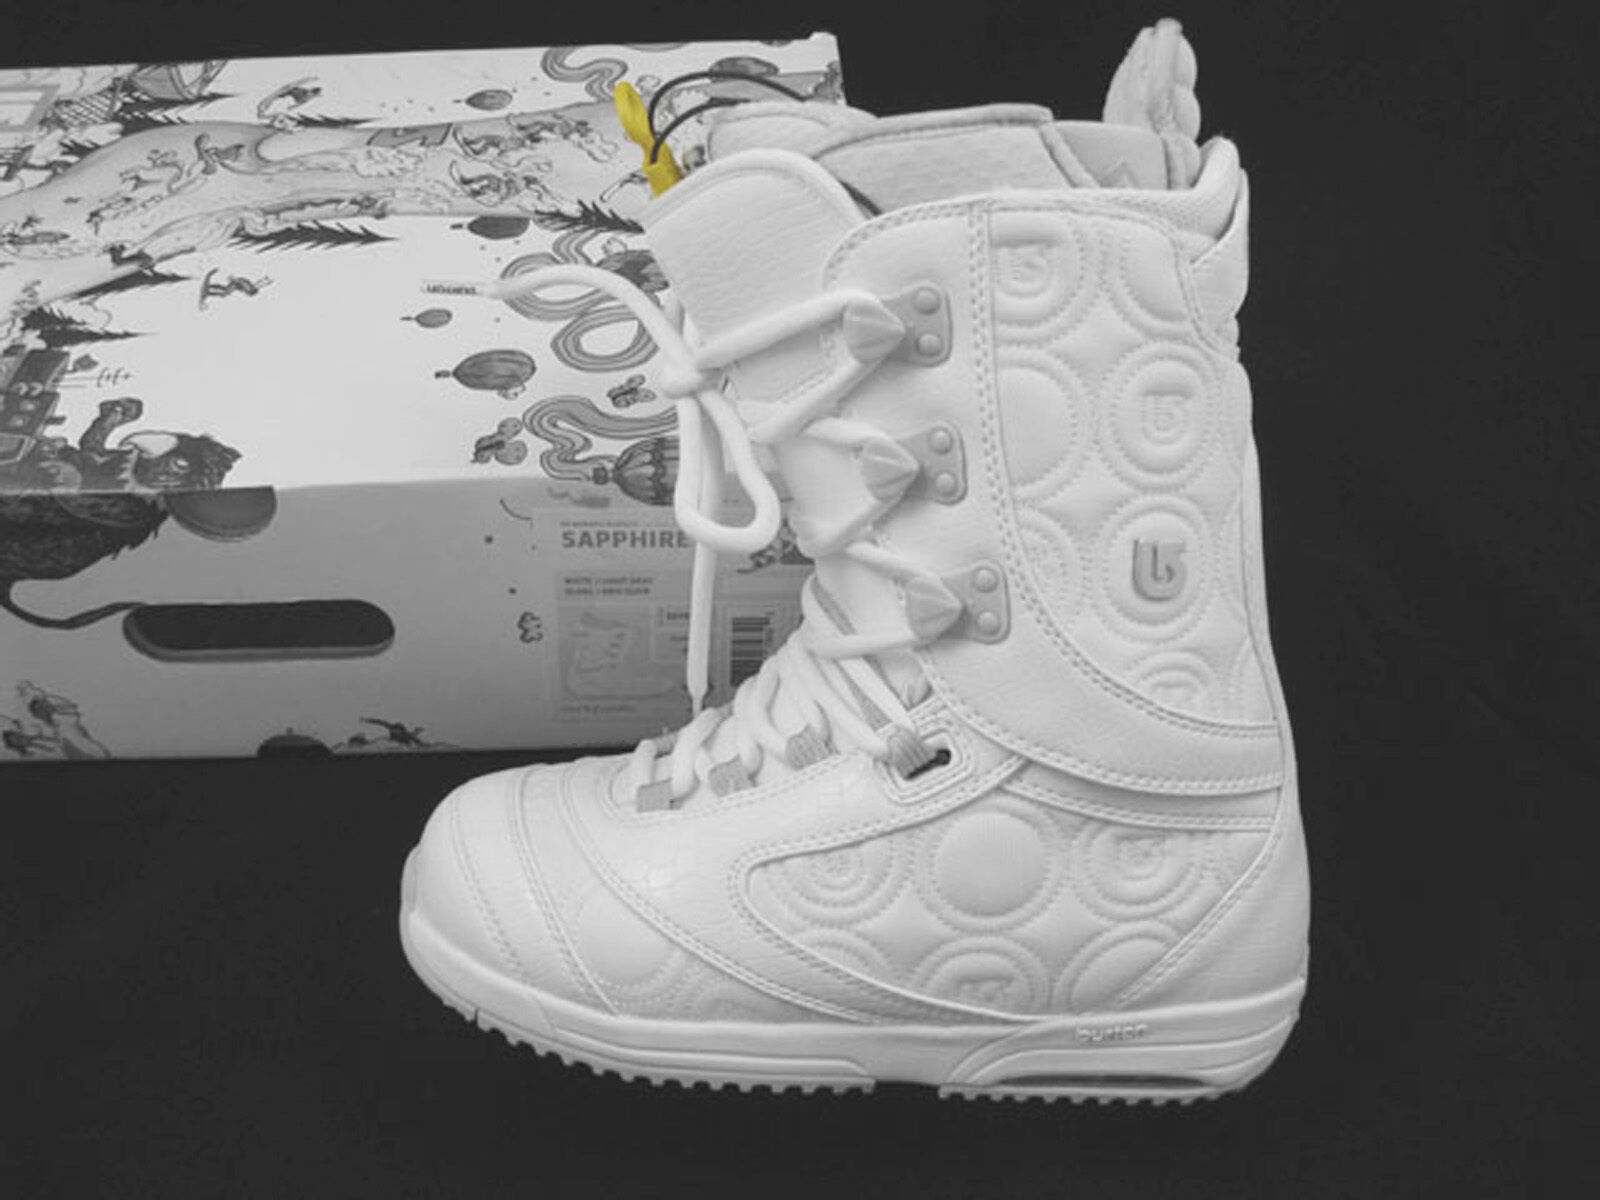 NEW Burton Sapphire Snowboard Boots  US 4 Euro 34 Mondo 21  White